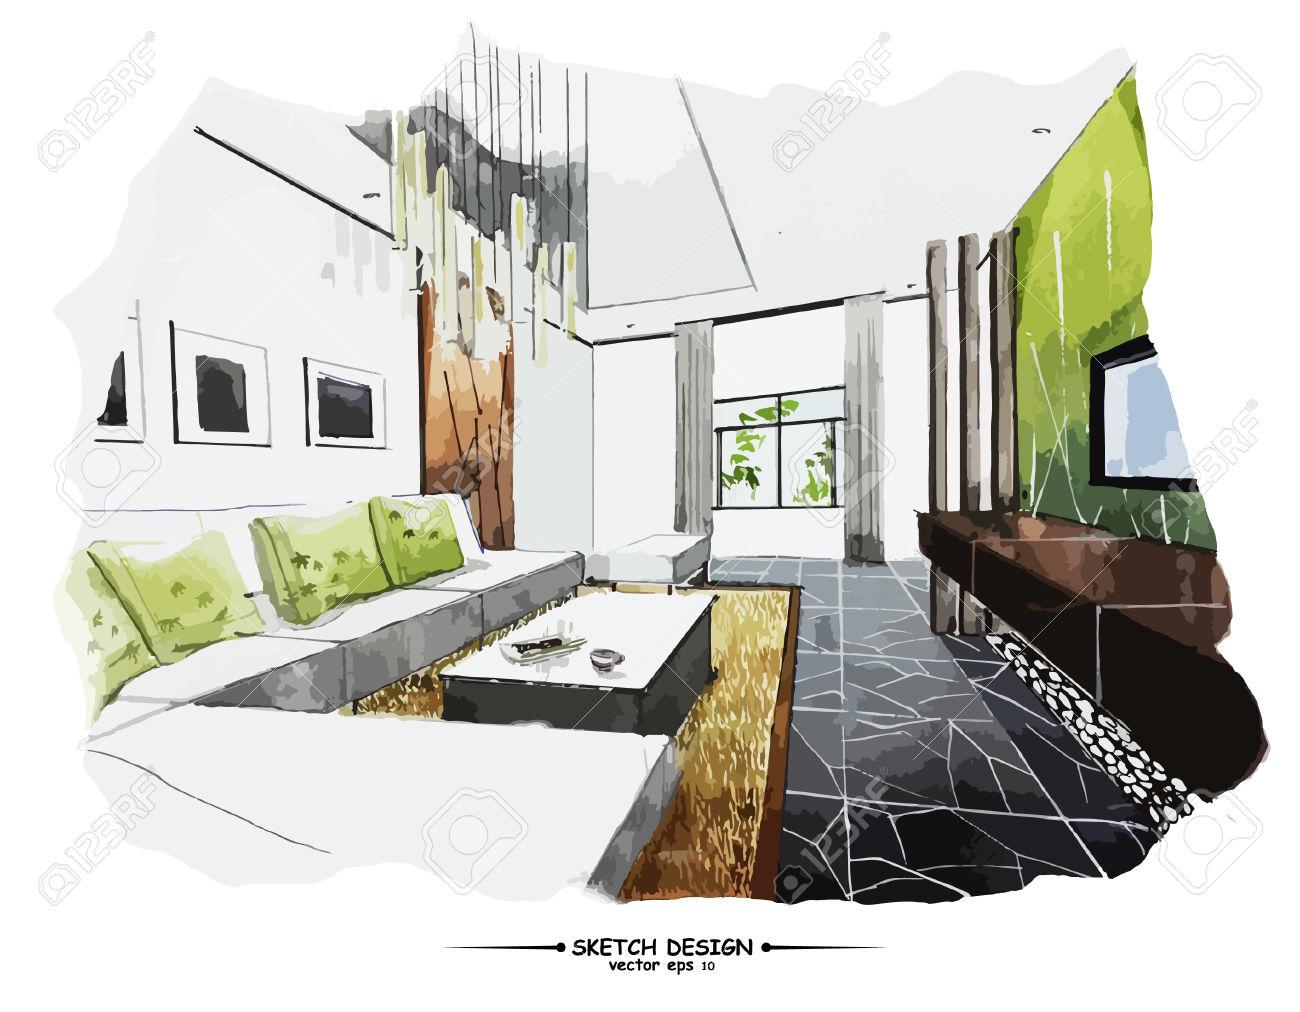 Apuntes revista digital de arquitectura bocetos a mano for Interior 1 arquitectura